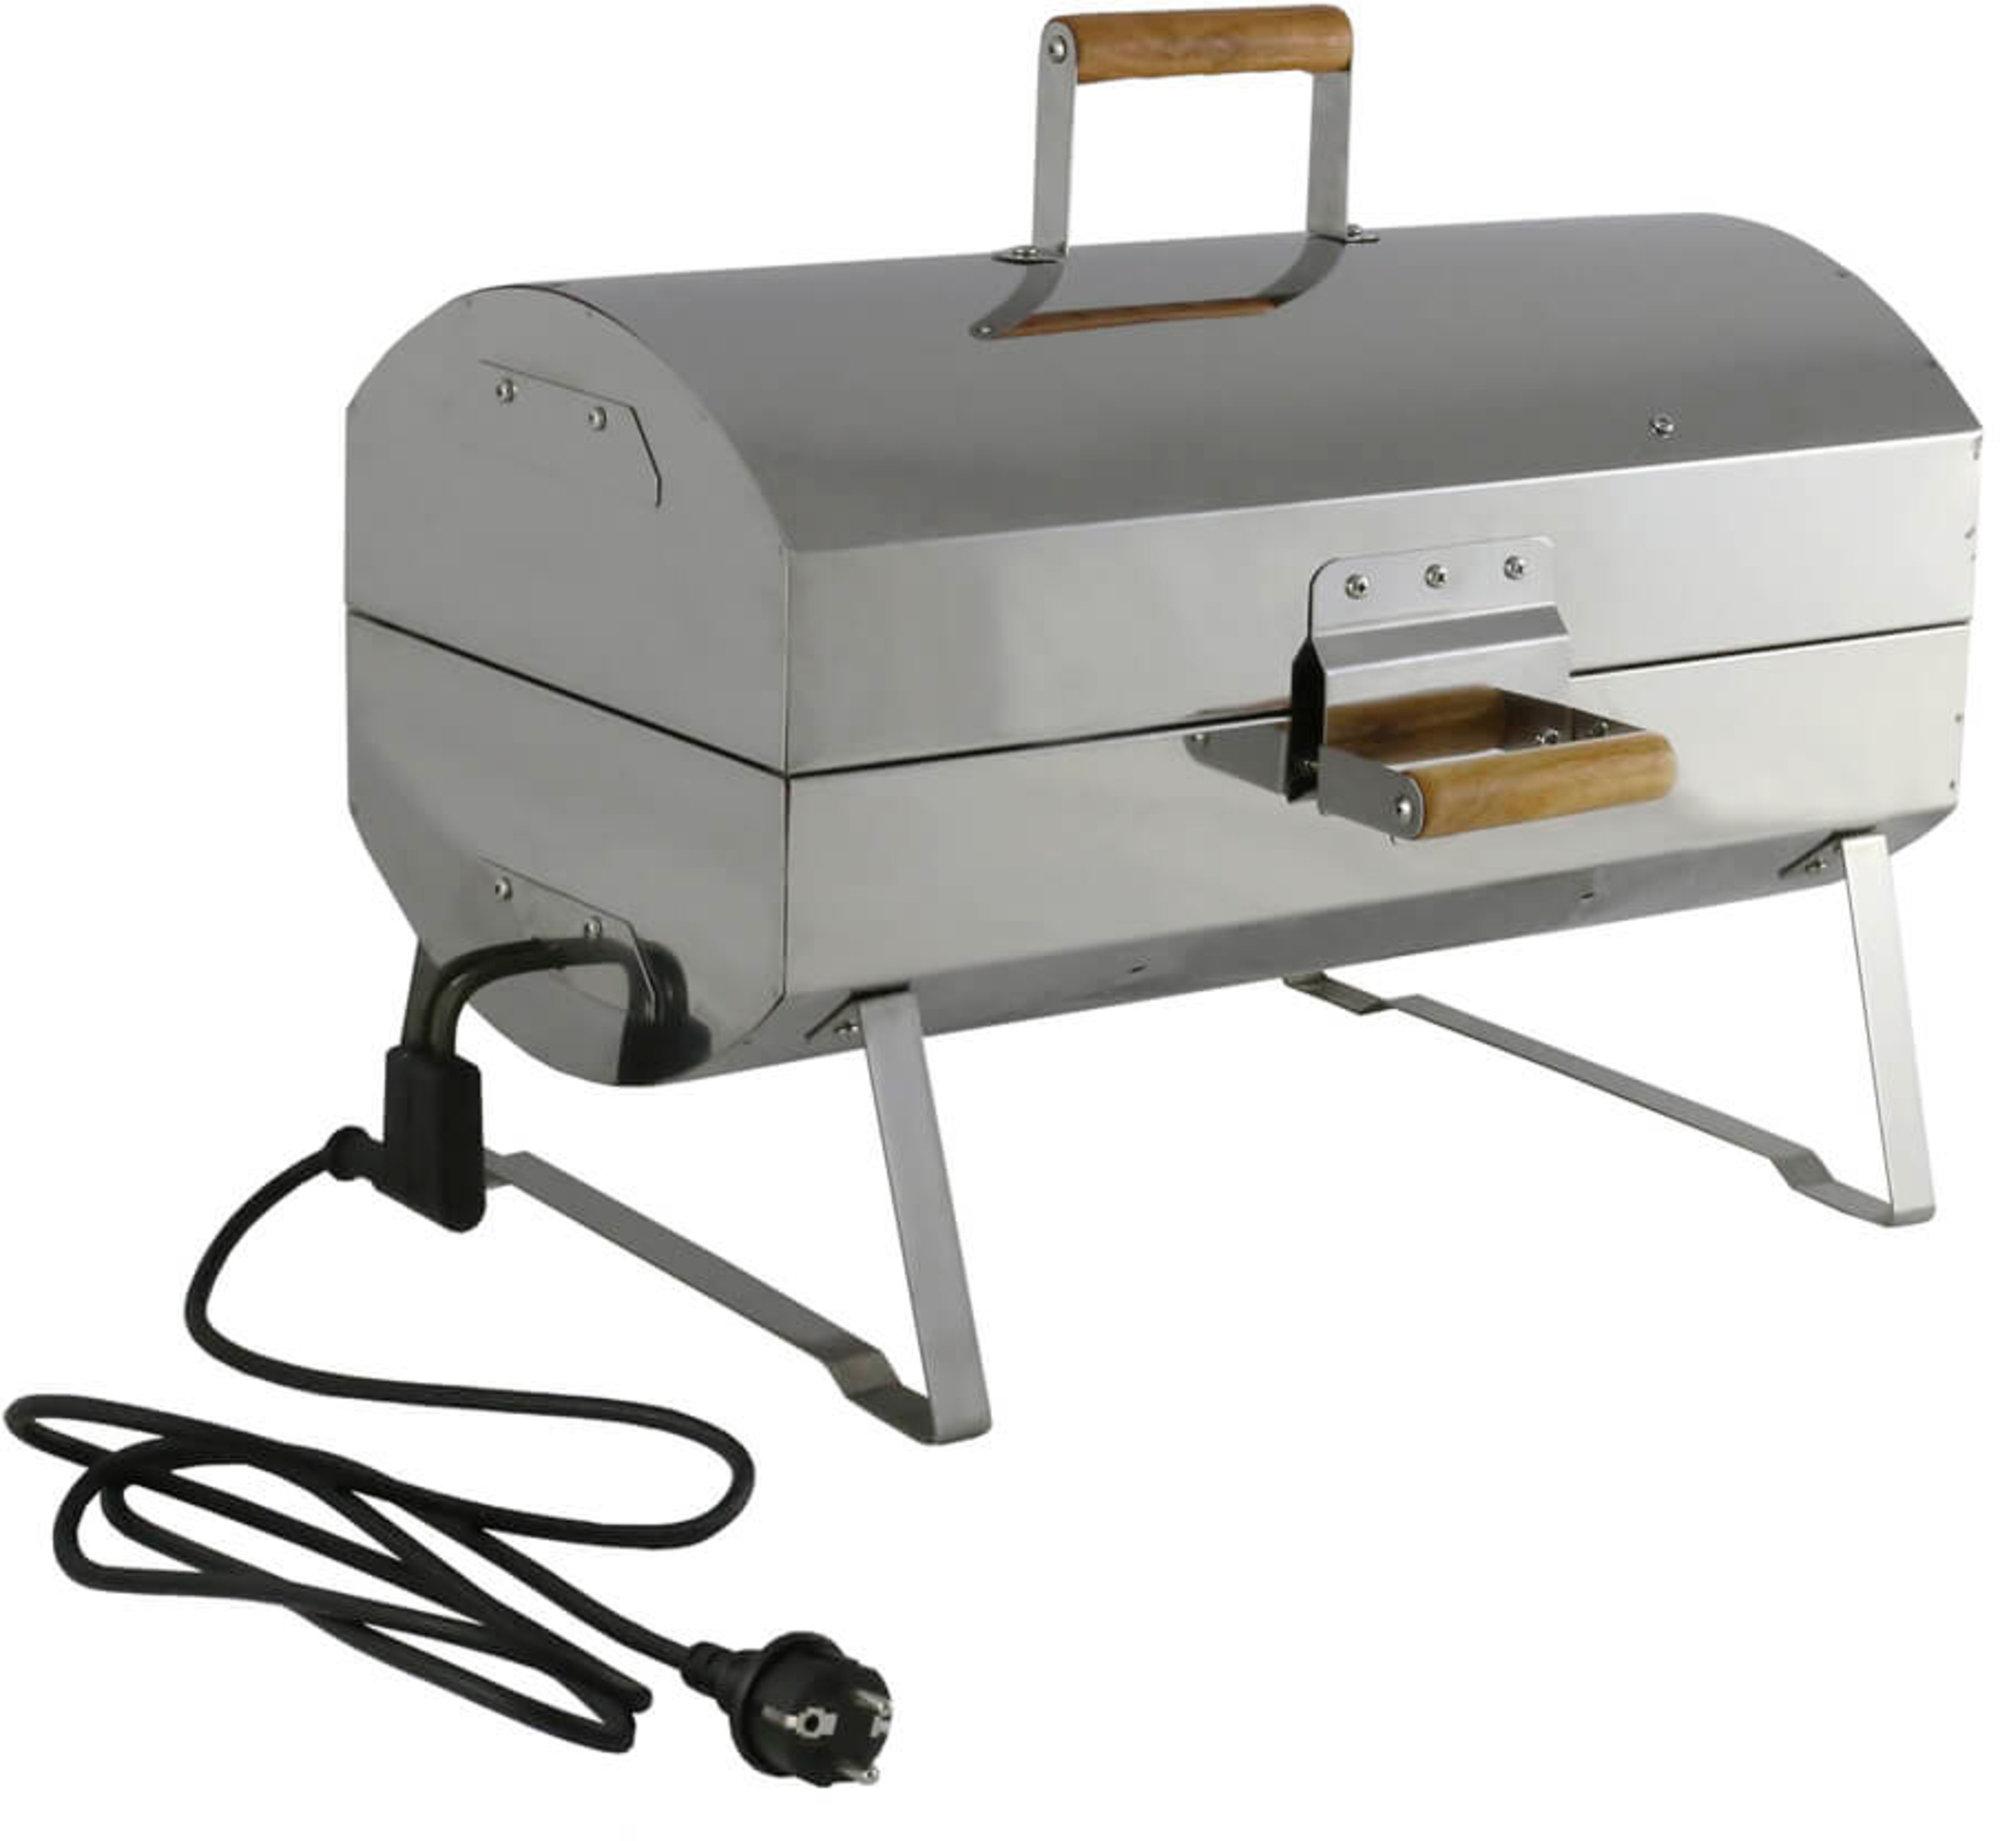 muurikka 120W grill wedzarnia